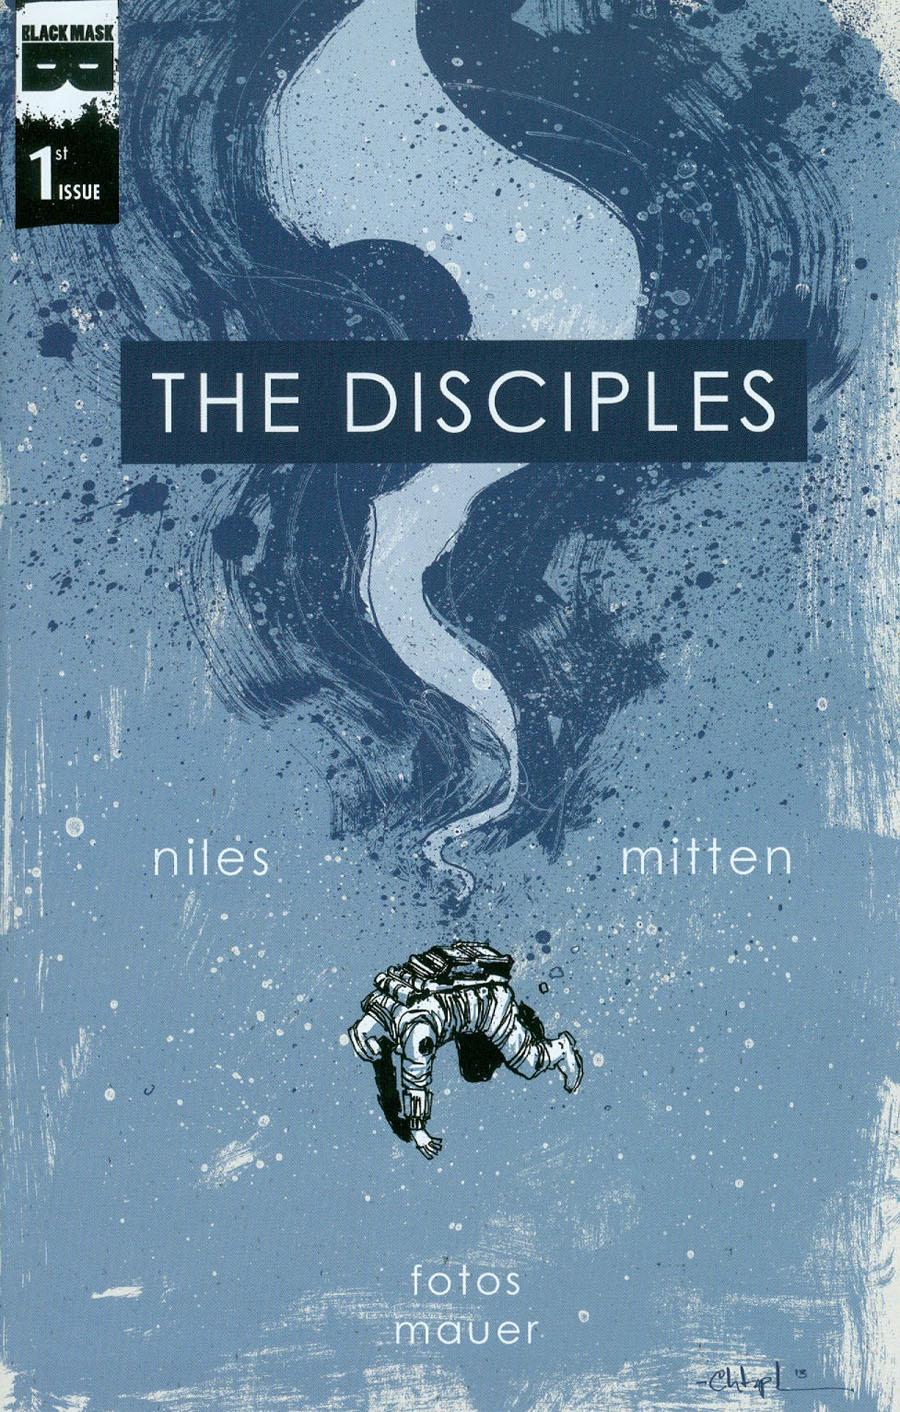 Disciples (Black Mask Comics) #1 Cover A 1st Ptg